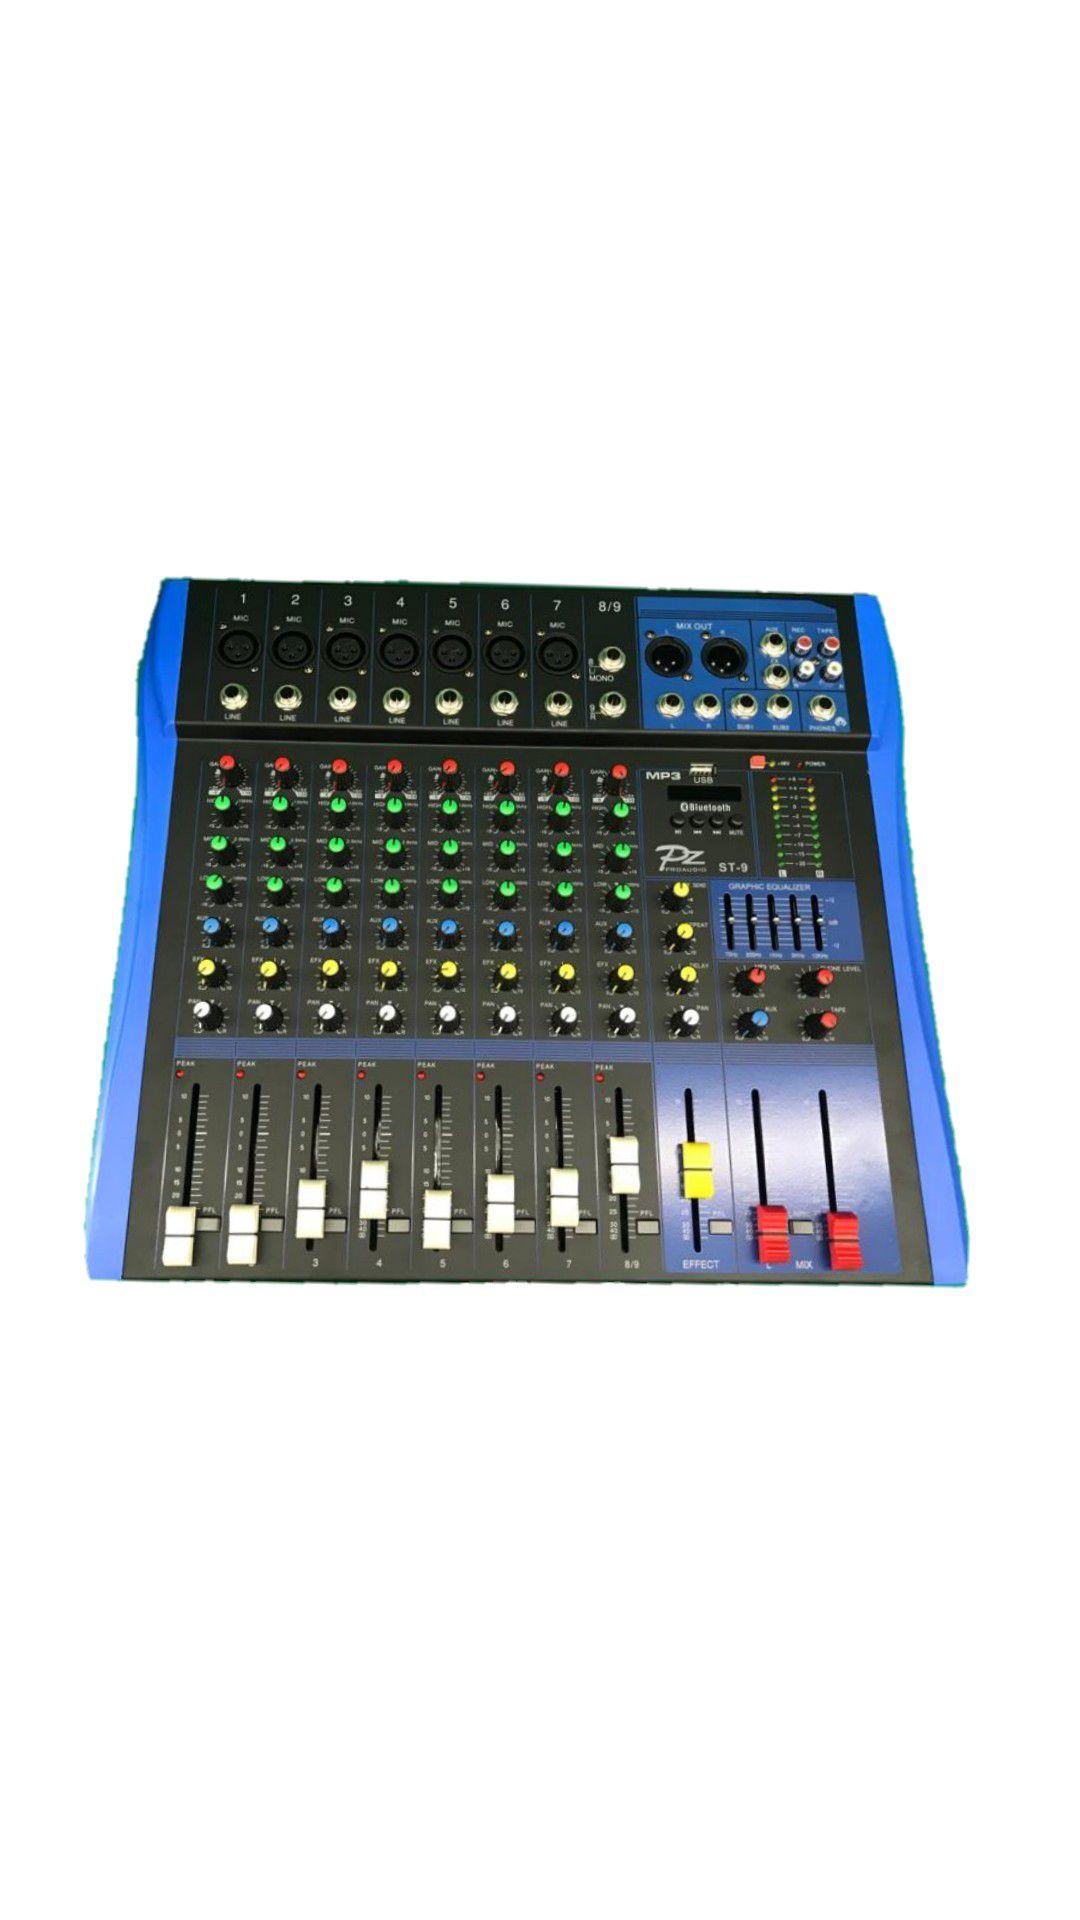 MESA.9CANAIS PZ PROAUDIO PZST9 7XLR 2P10 C/PHANTOM USB BLUETOOTH 1AUX